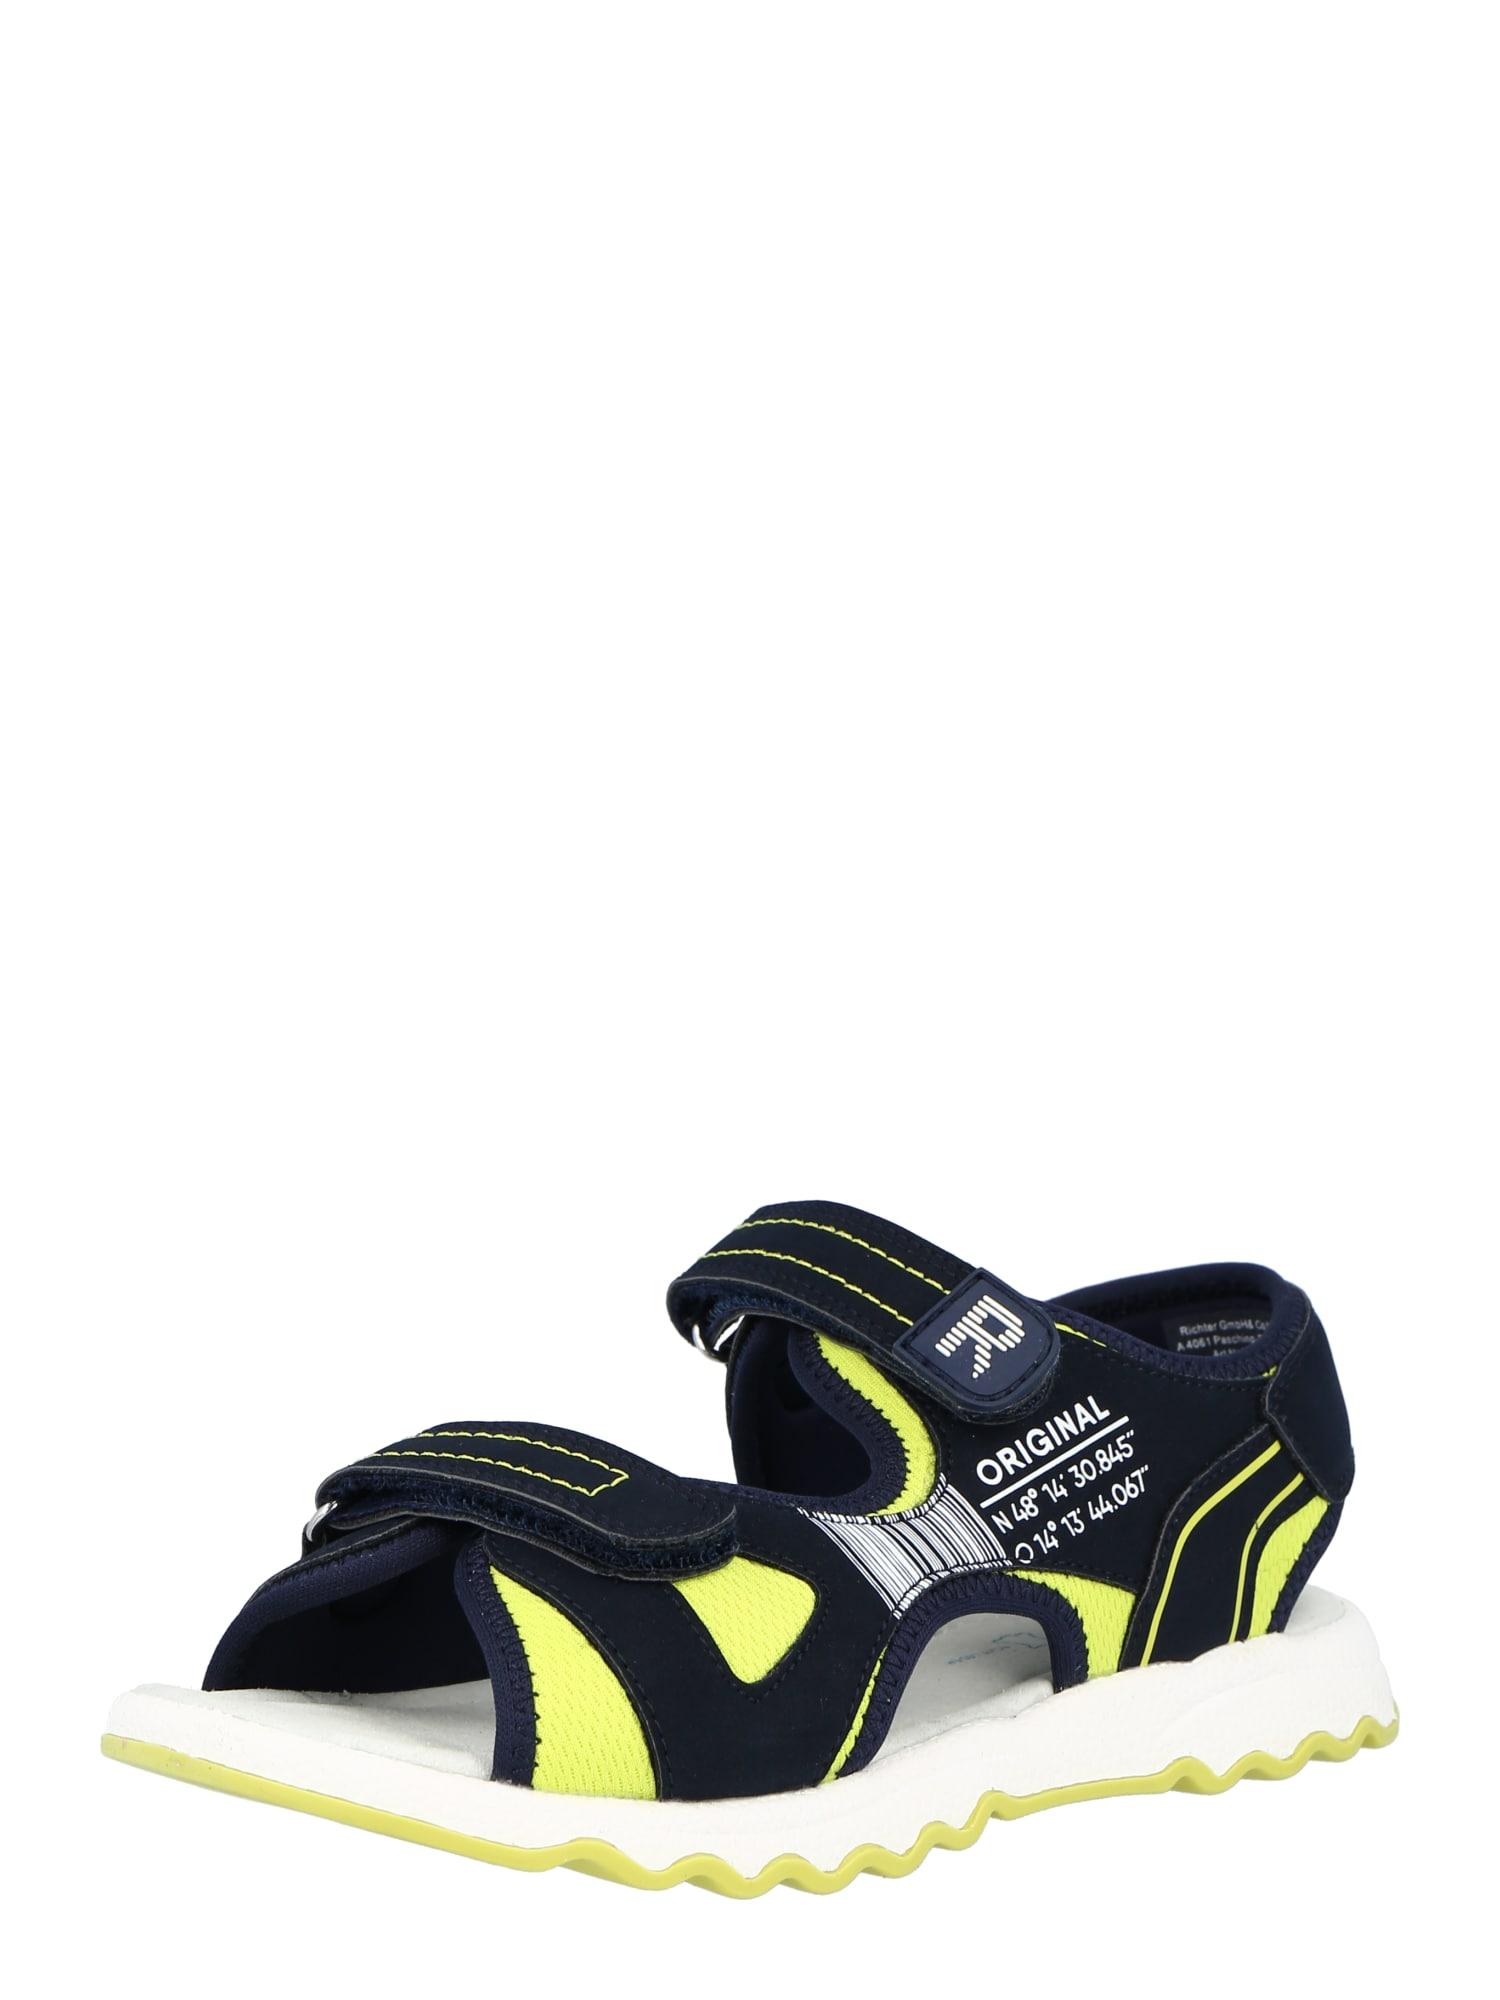 RICHTER Atviri batai mėlyna / neoninė geltona / balta